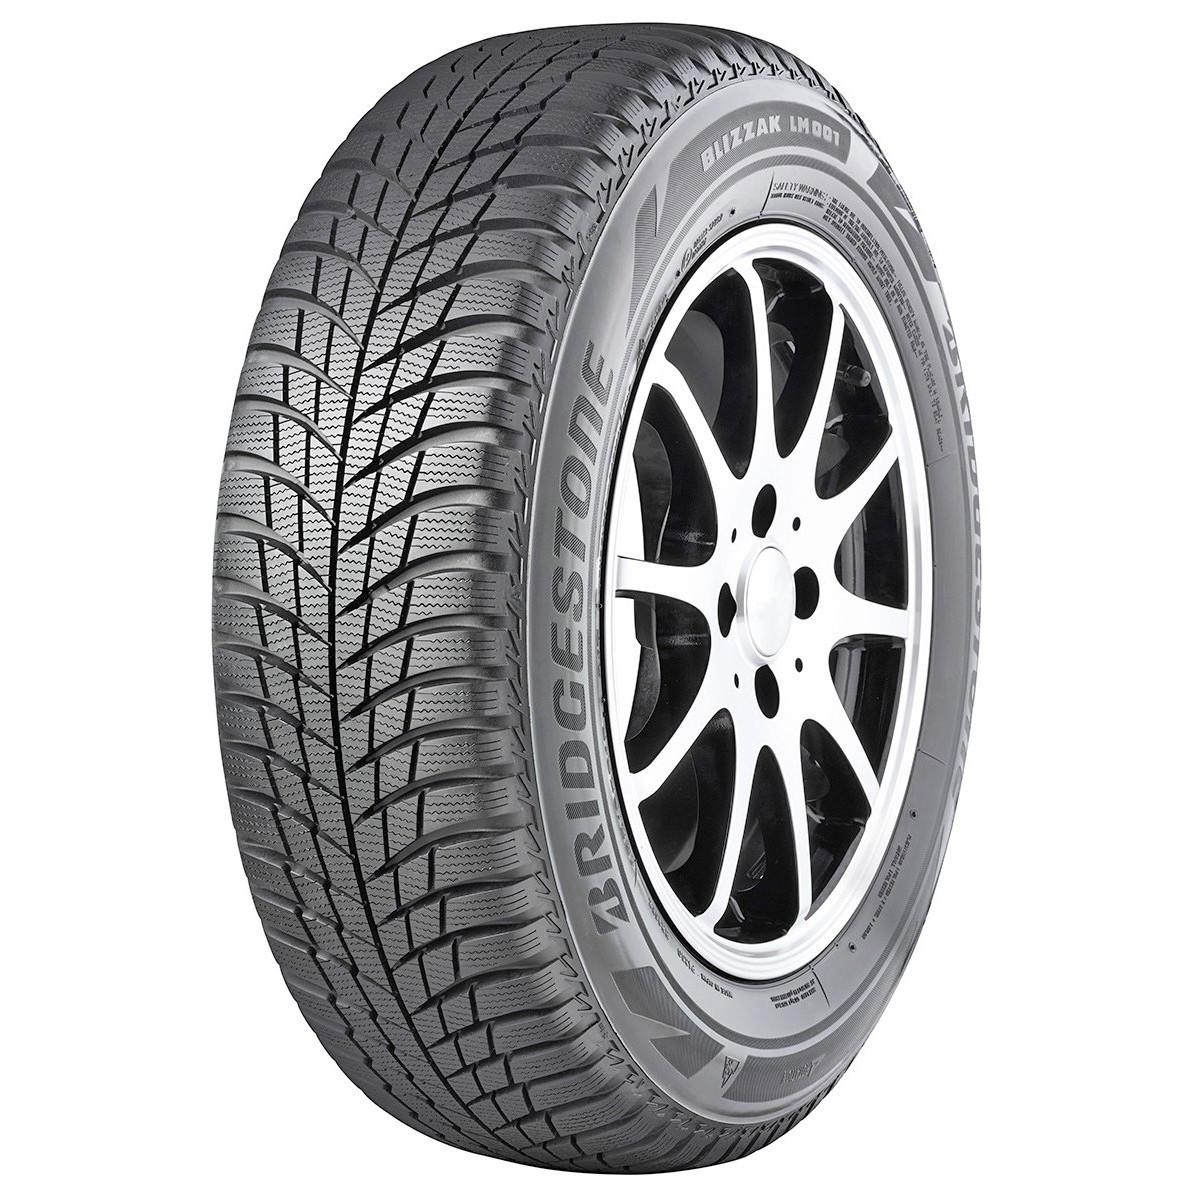 Bridgestone Blizzak LM001 205/60 R16 96H XL